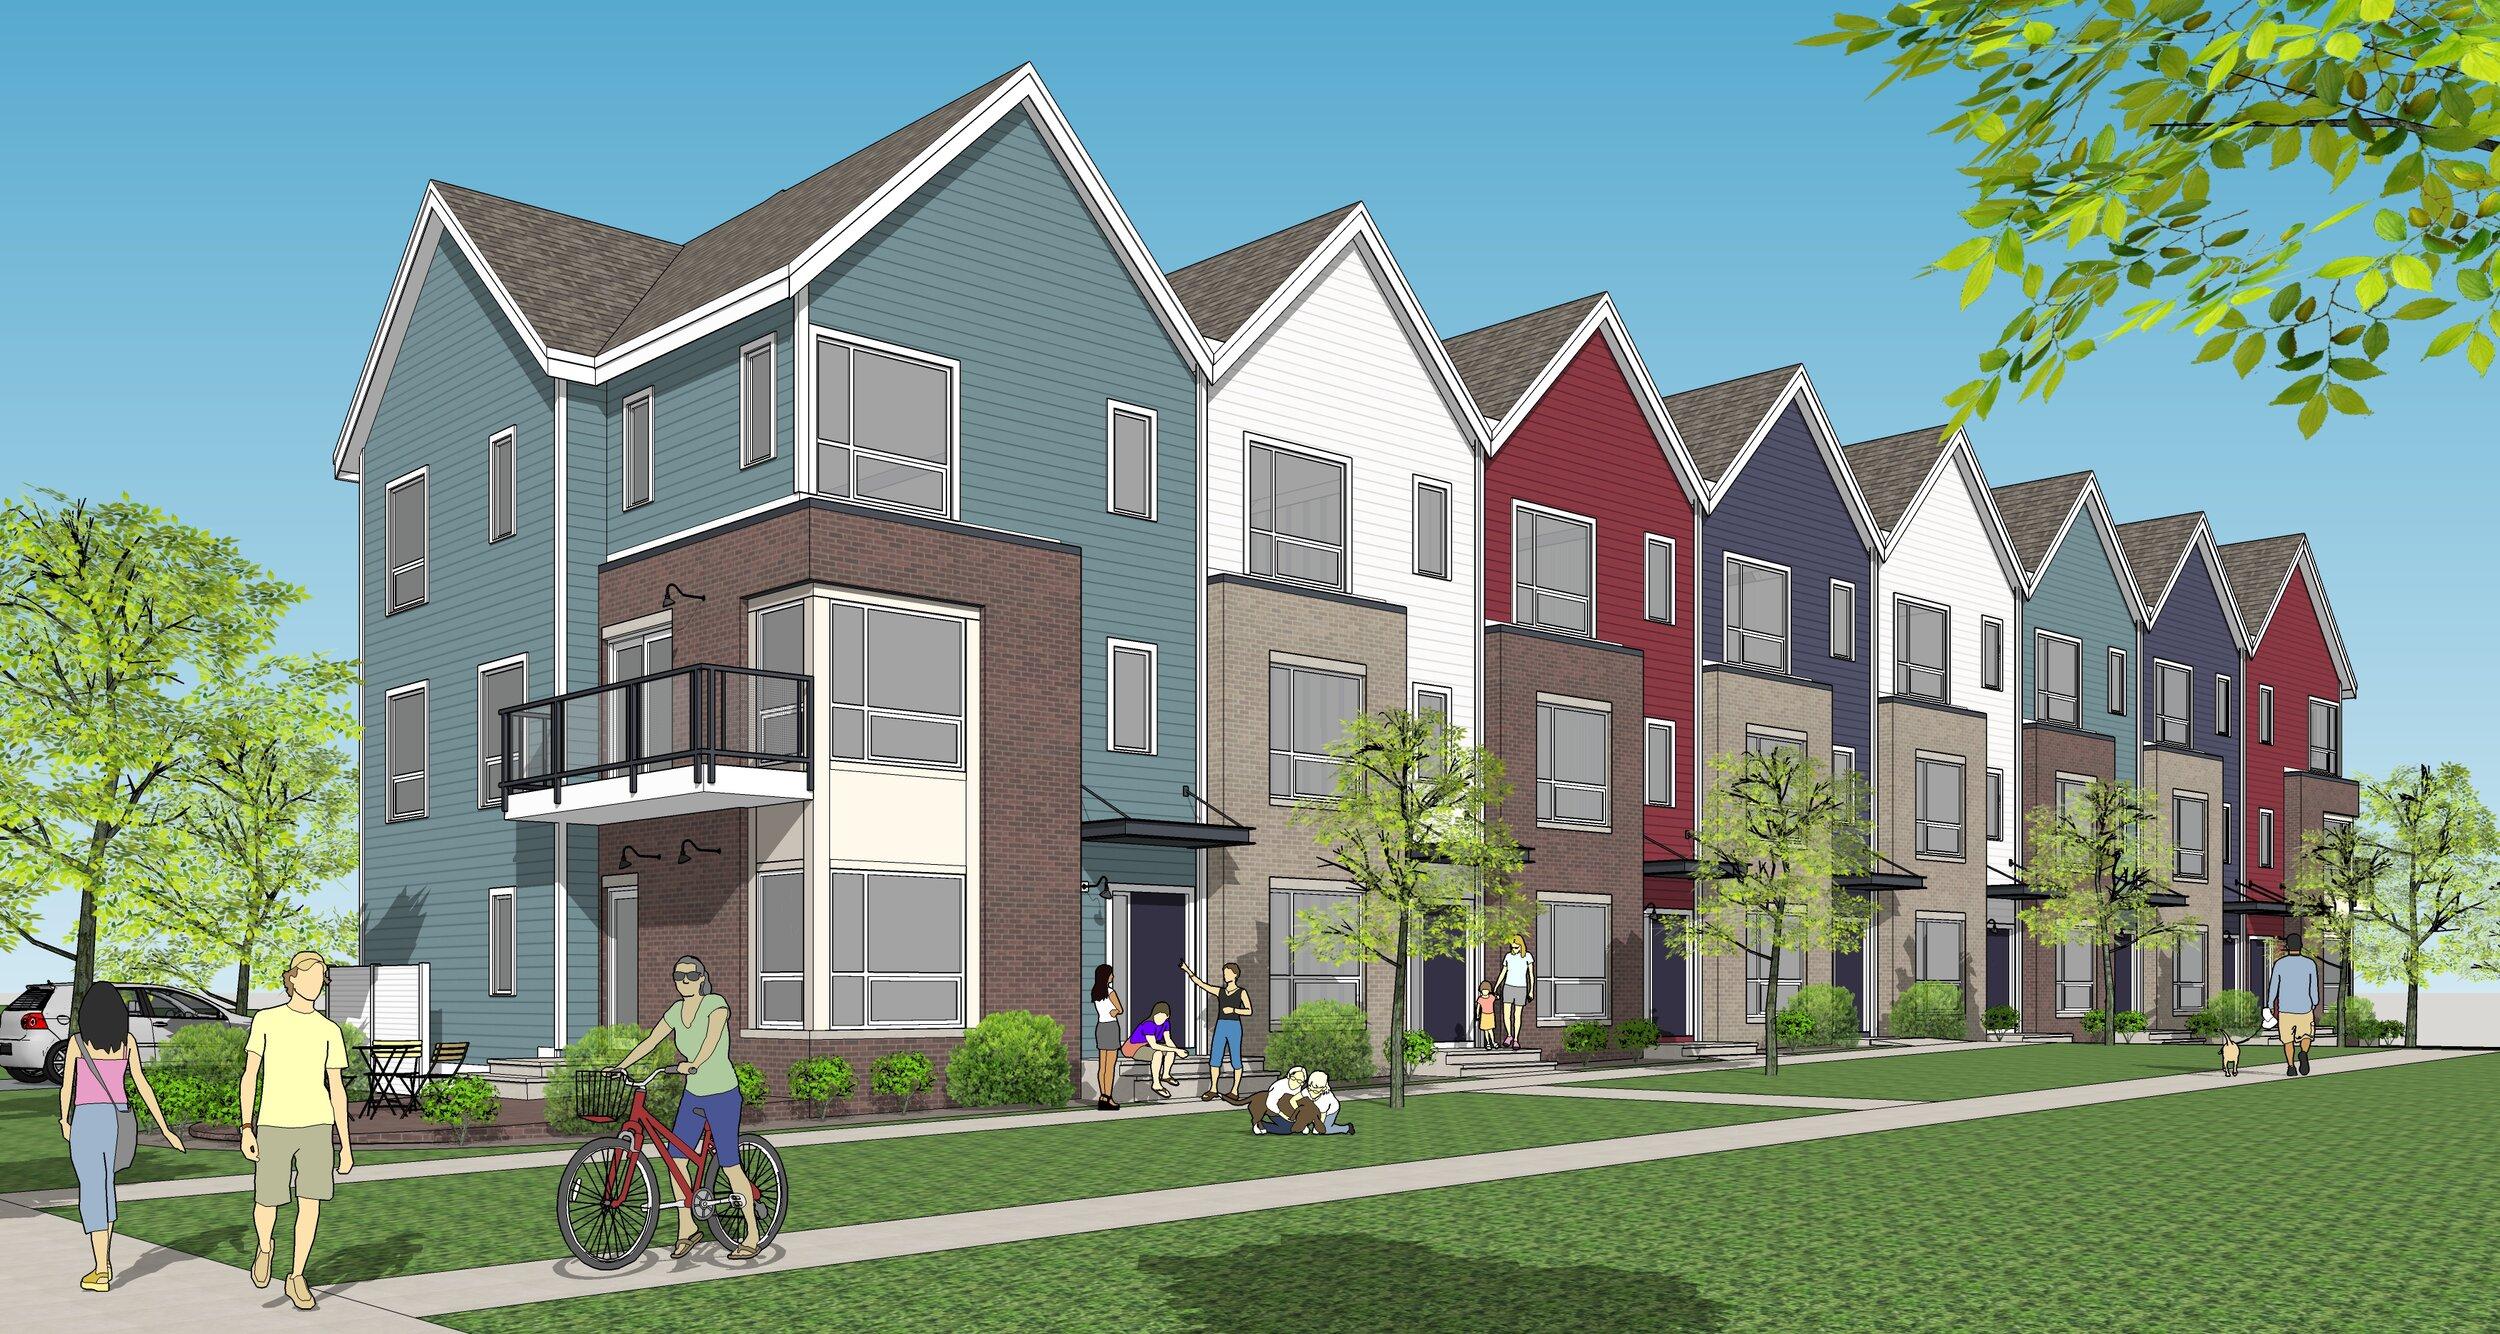 River Walk Townhome Model Rendering.jpg